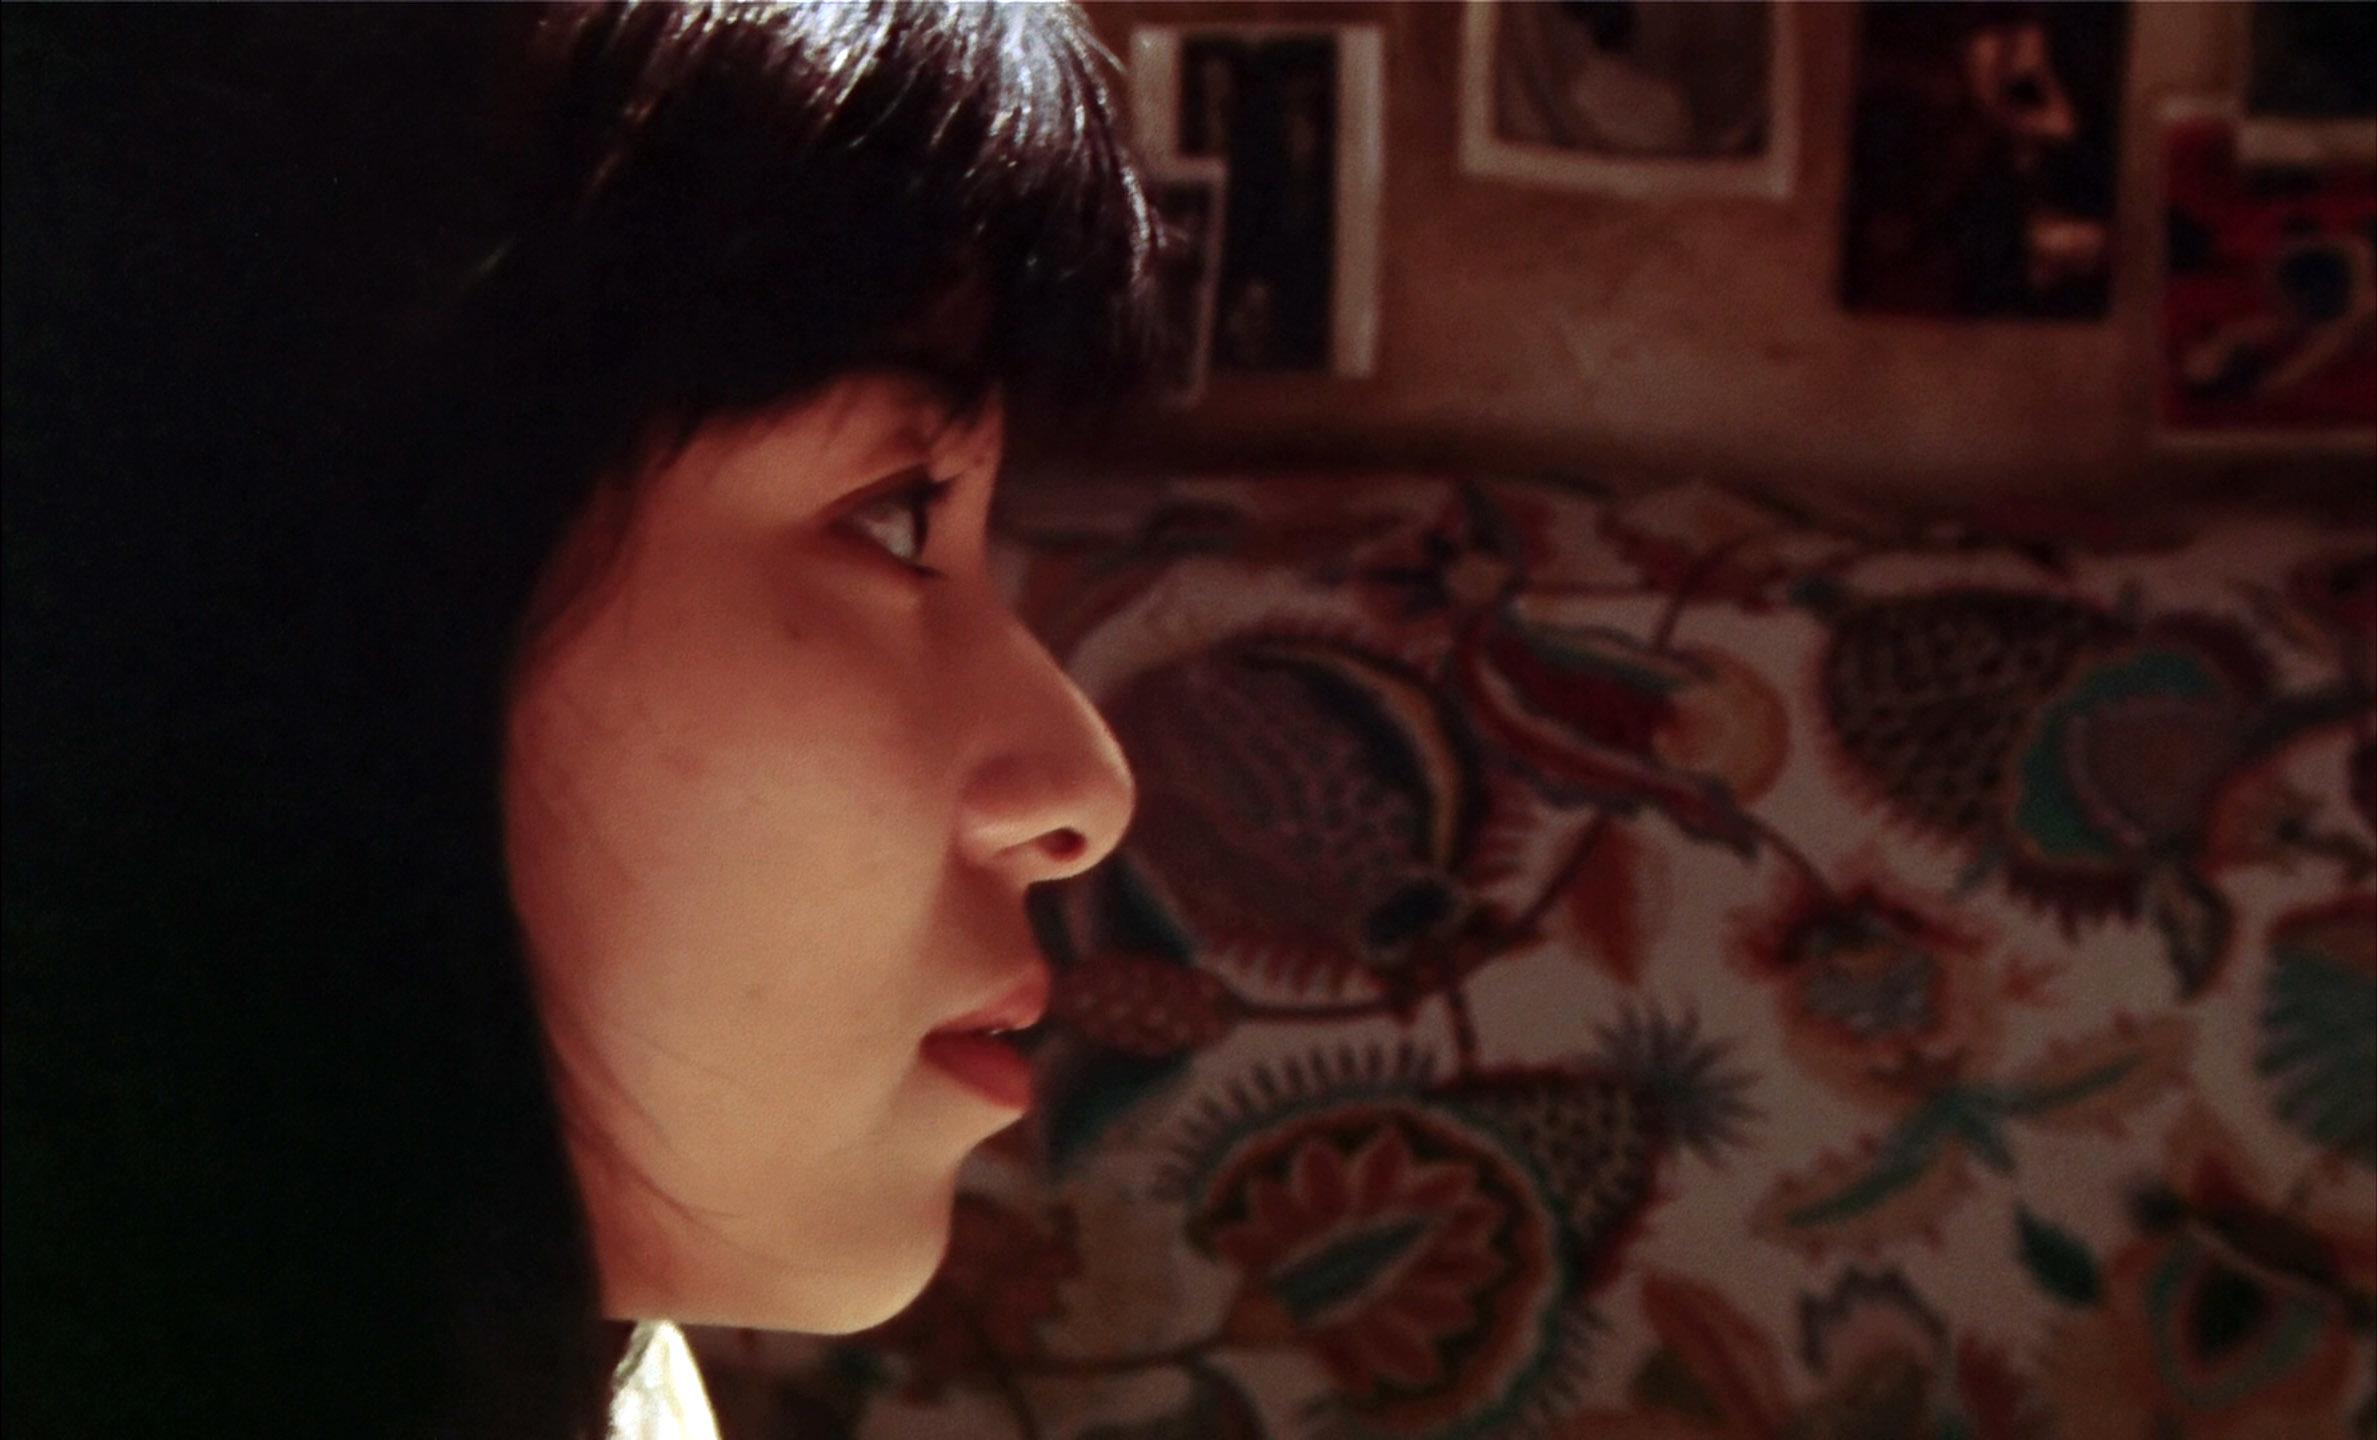 Claudine Barretto (b. 1979),Debra Mooney Porn fotos Jane Morgan (actress),Shalini (Baby Shalini)